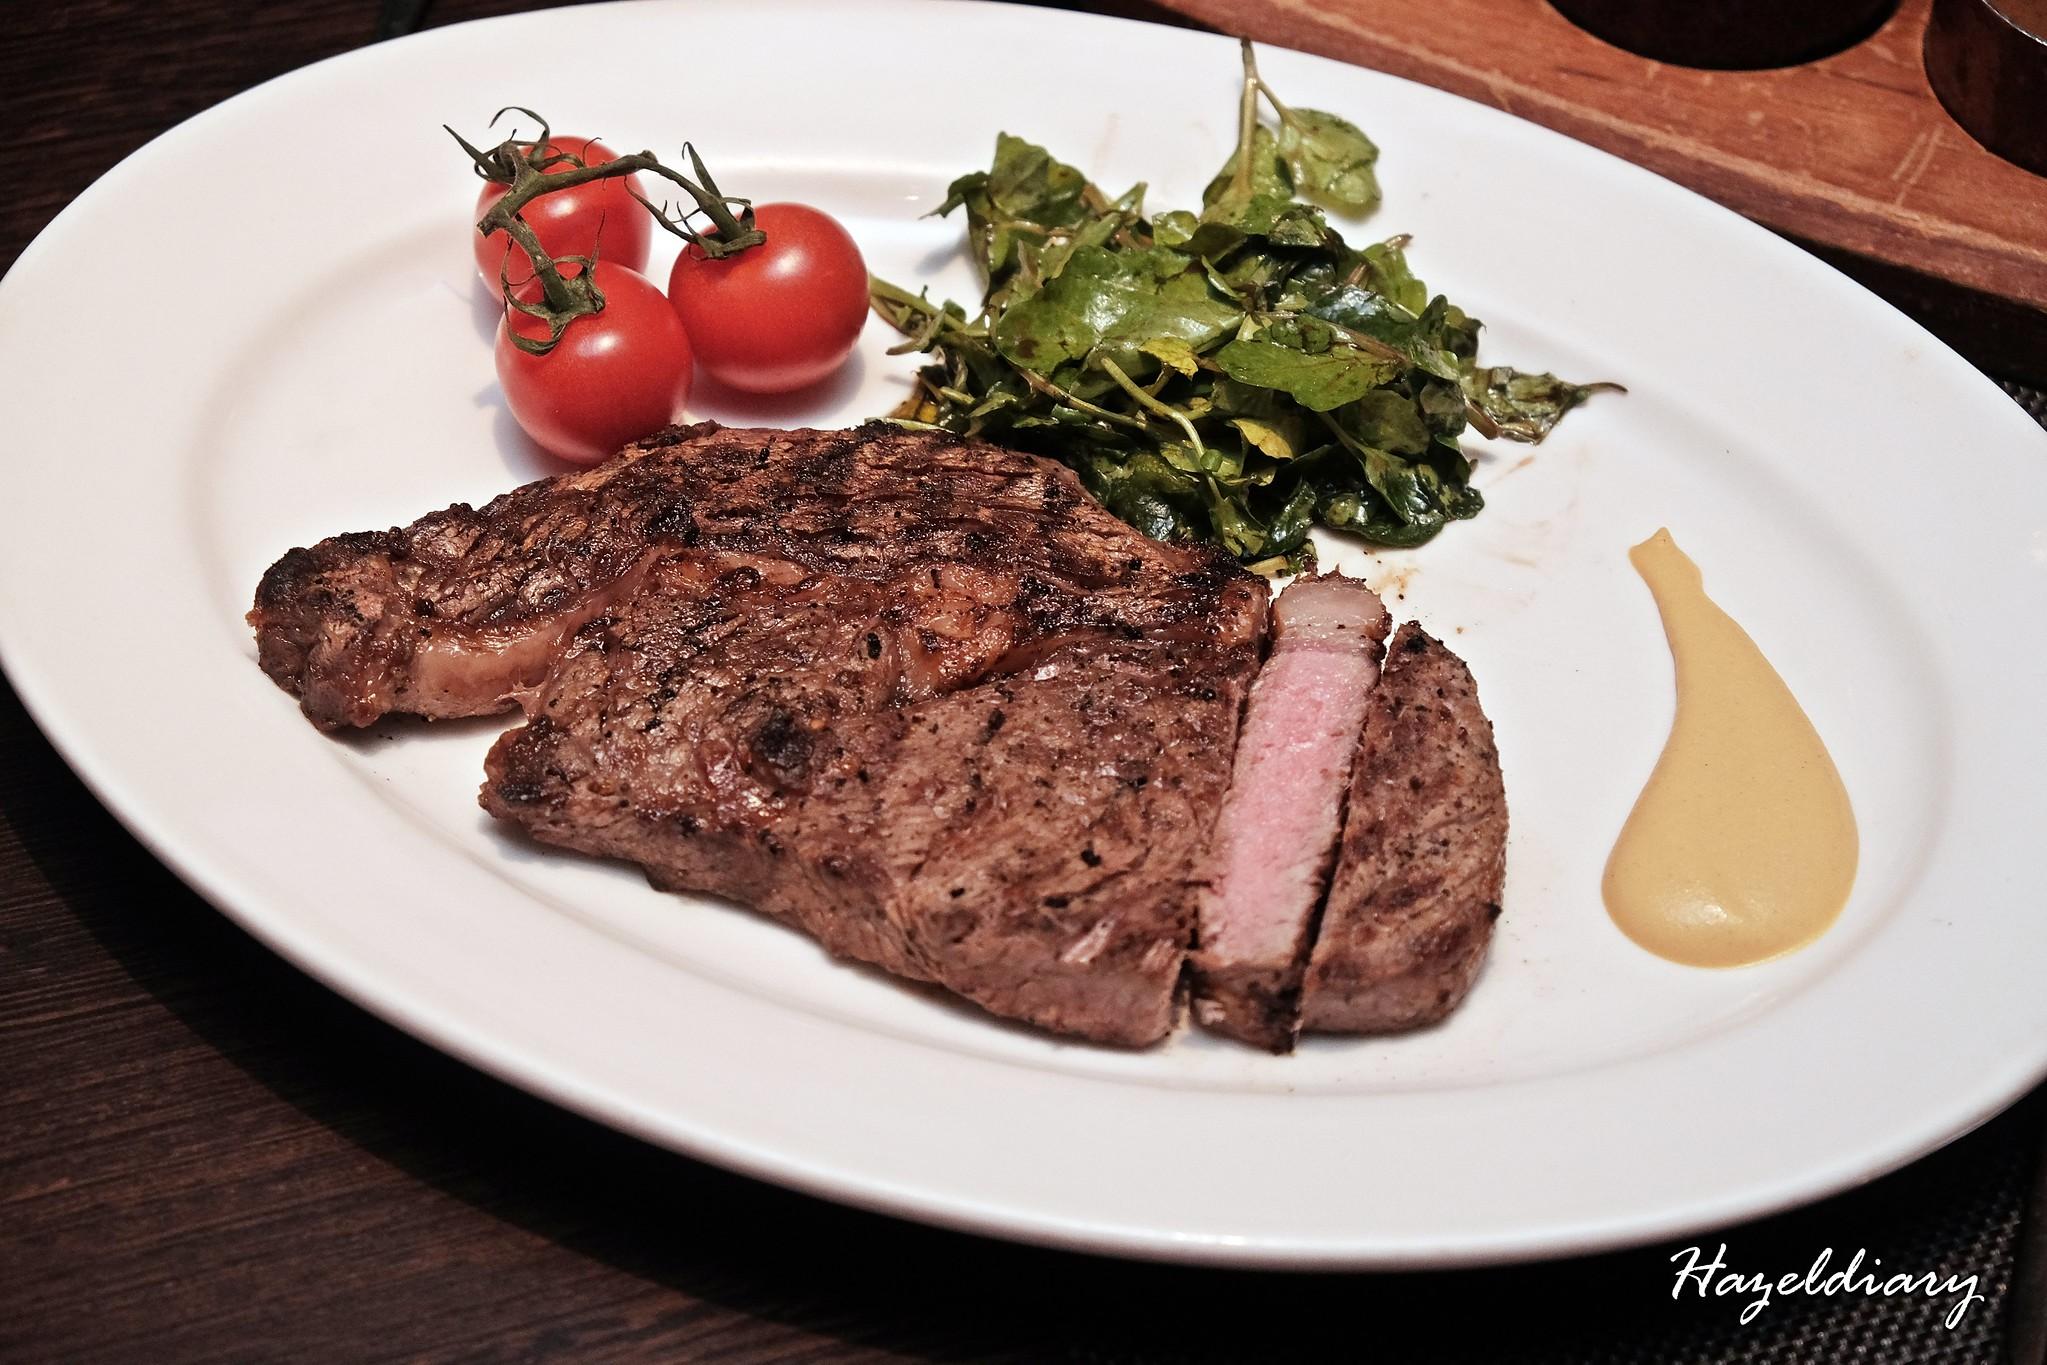 wooloomooloo steakhouse-120-day grain fed Australian Rib Eye-1